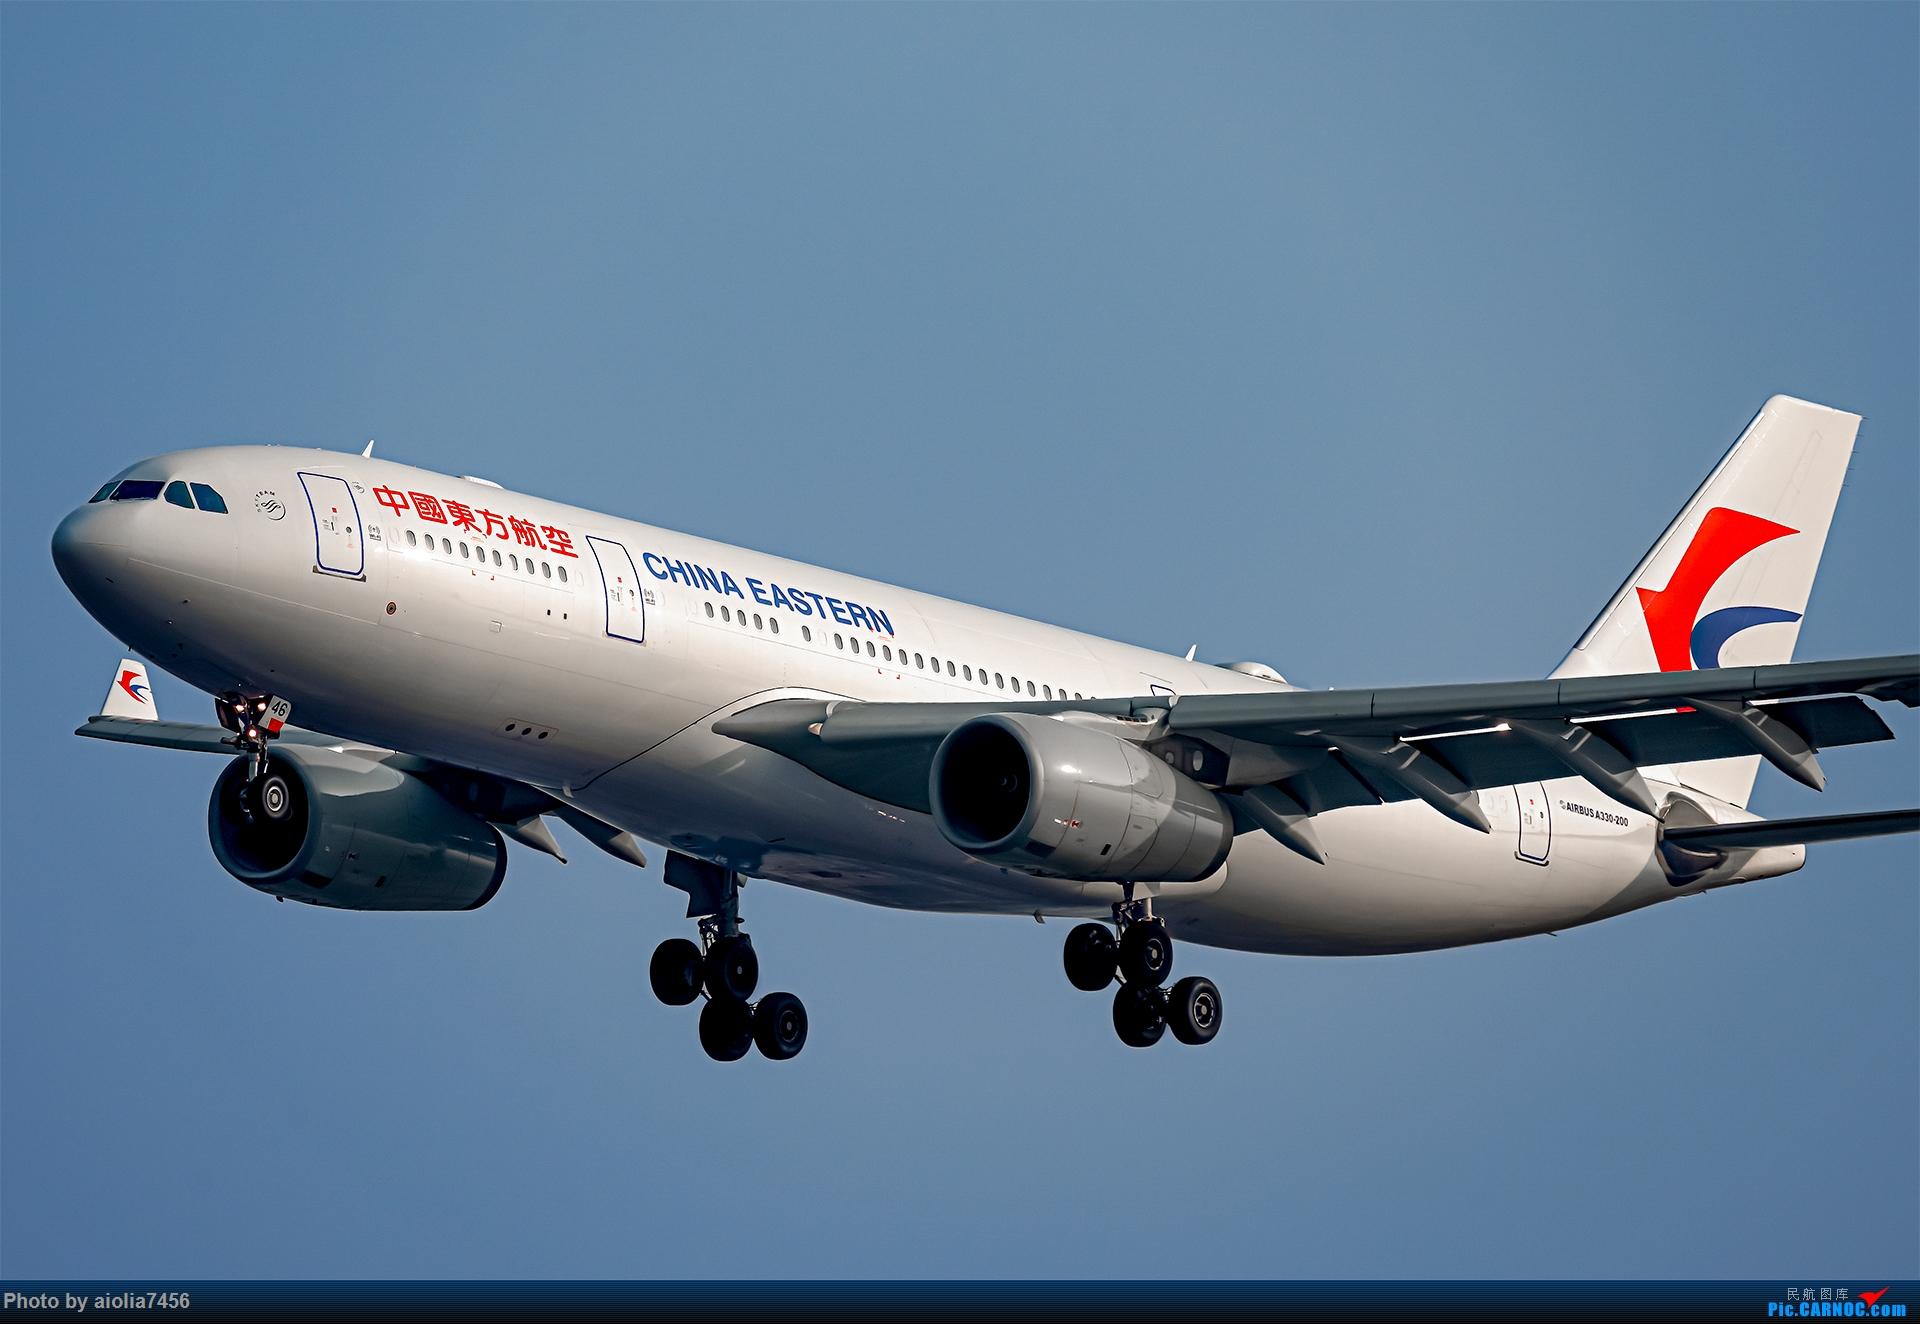 Re:[原创]【霸都打机队】上海培训时顺带虹桥扫货,结果遇到水泥天 AIRBUS A330-200 B-6546 中国上海虹桥国际机场